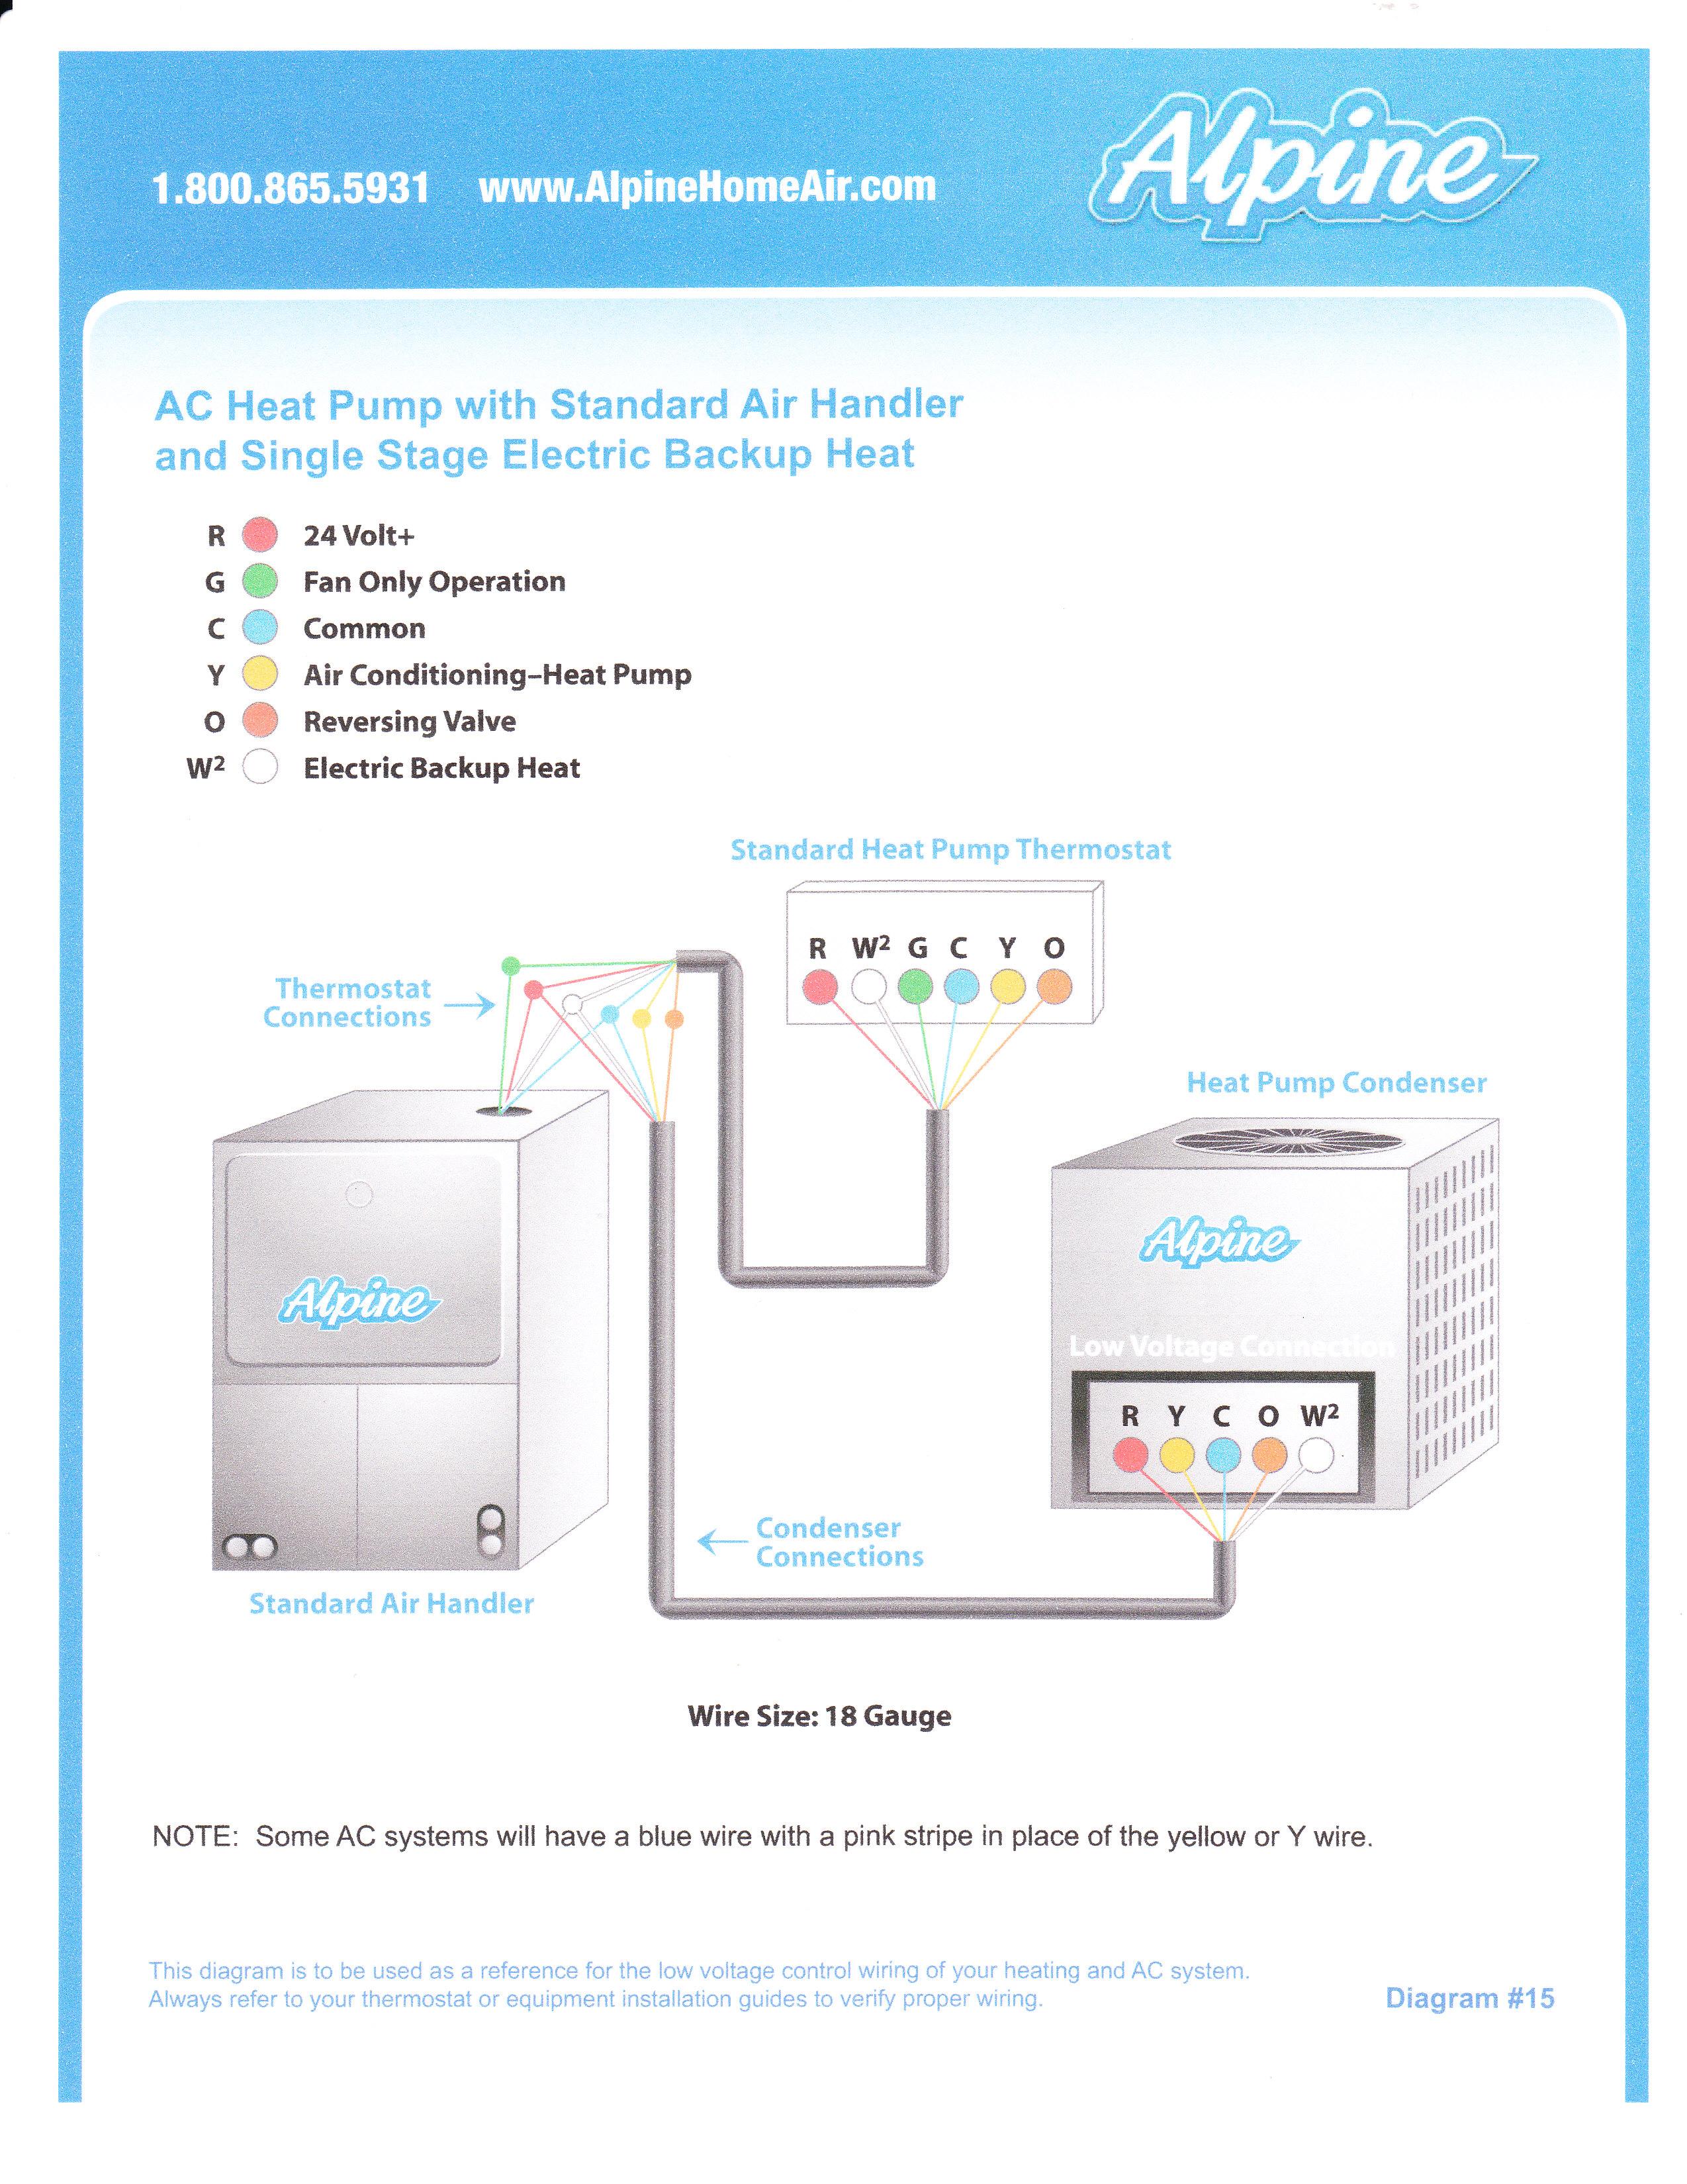 wiring diagram older furnace trane heat pump thermostat wiring diagram e1 wiring diagram  trane heat pump thermostat wiring